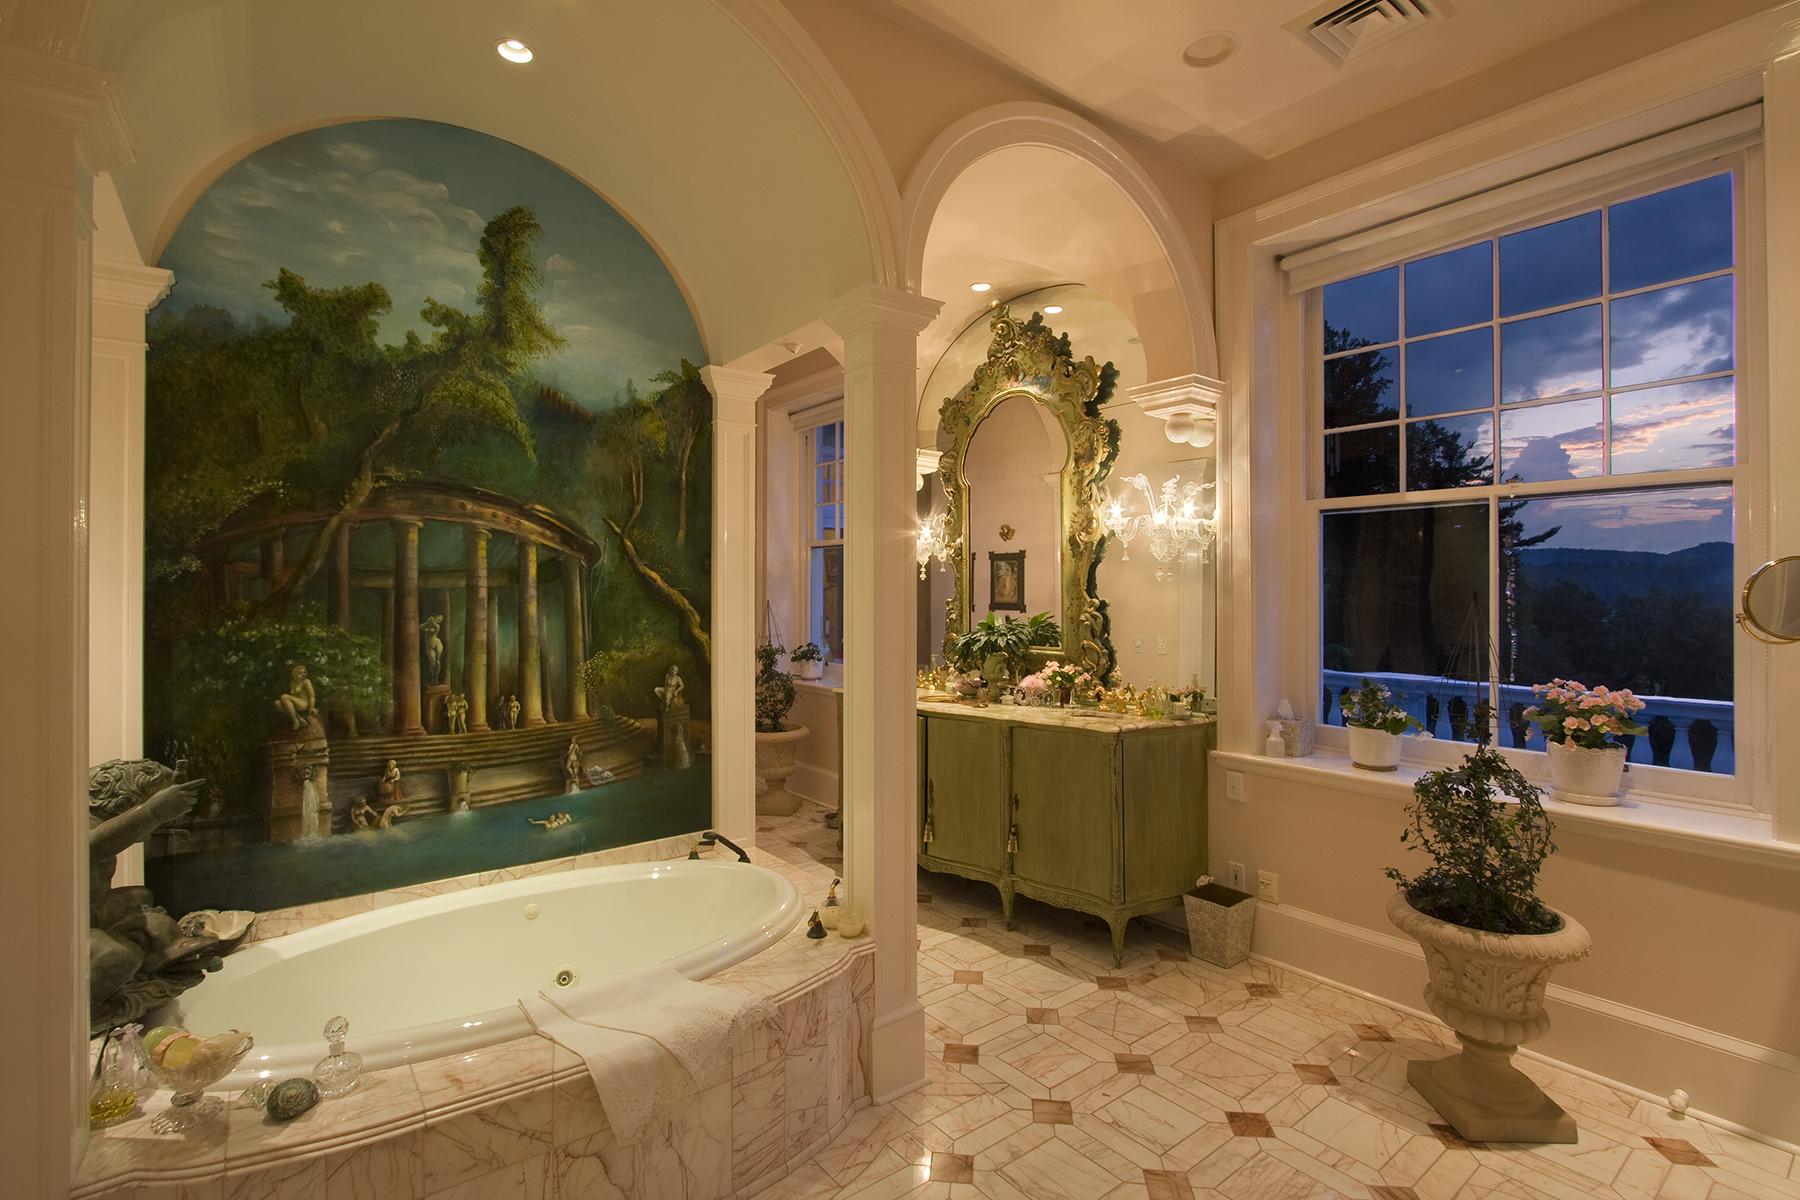 Additional photo for property listing at 1001 Estate Dr , Chanteloup, Flat Rock, NC 28739 1001  Estate Dr Chanteloup,  Flat Rock, North Carolina 28739 United States